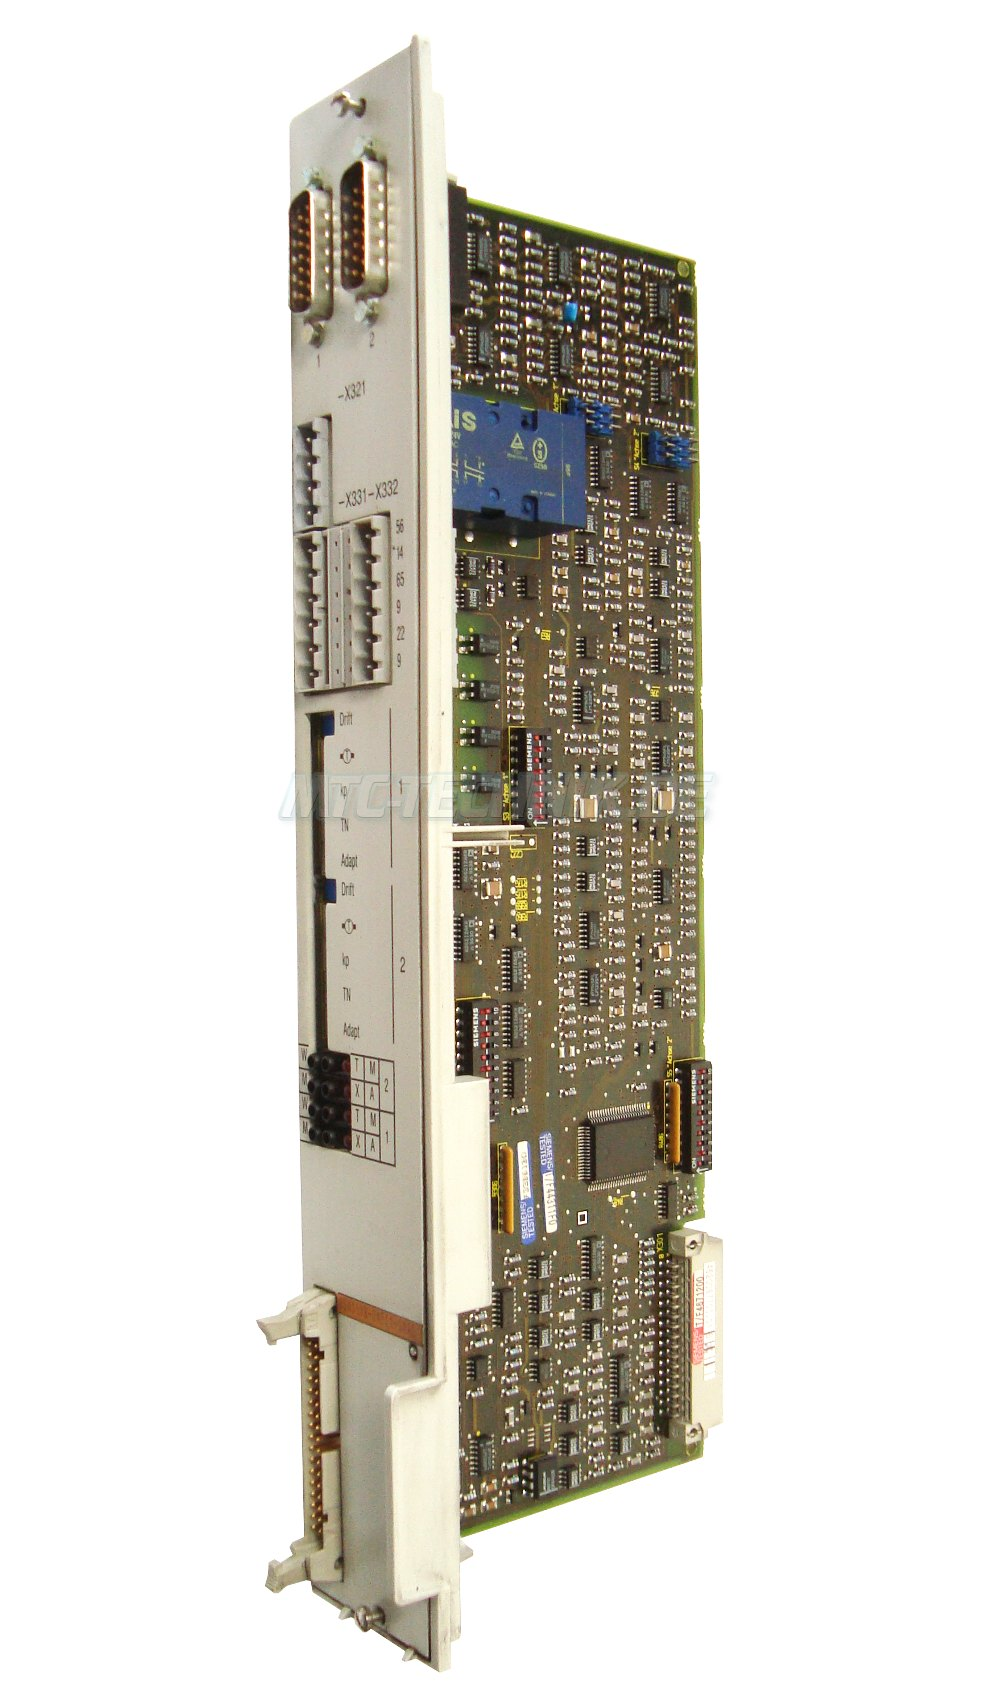 1 Siemens Simodrive 6sn1118-0ae11-0aa0 Einschubkarte